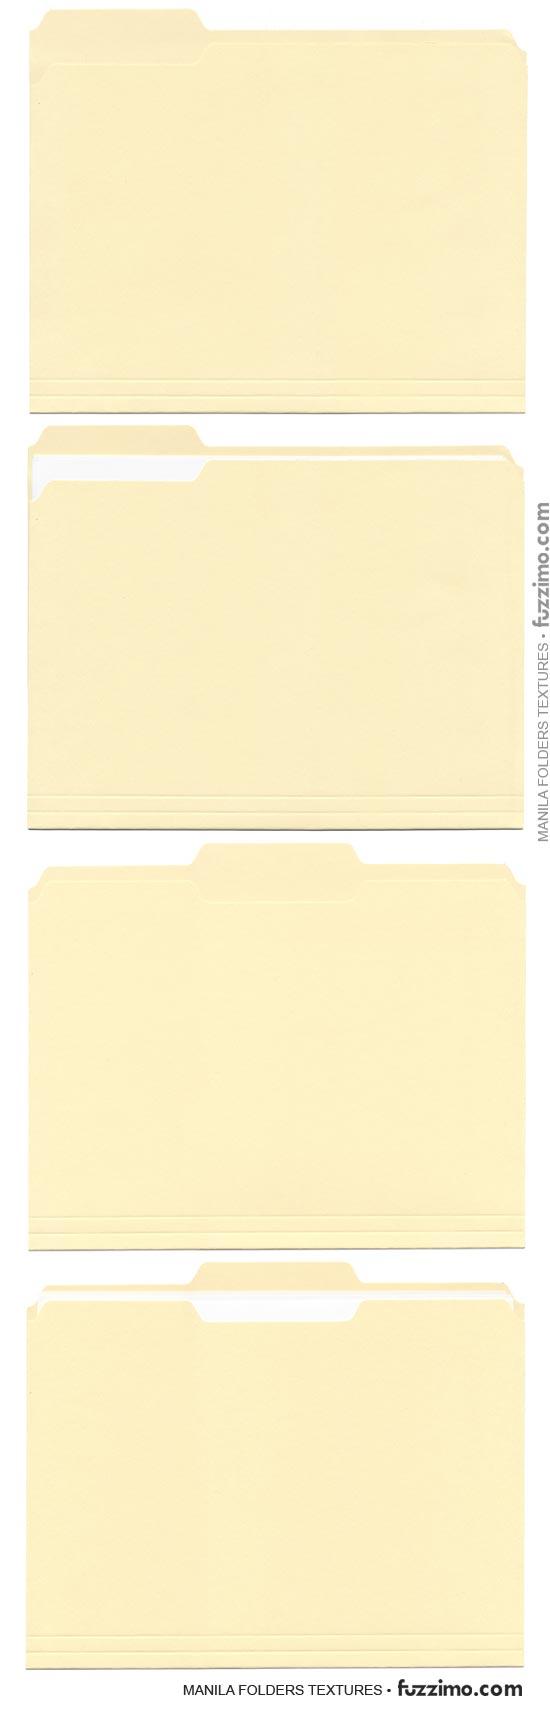 fzm-Manila-Folders-Textures-02